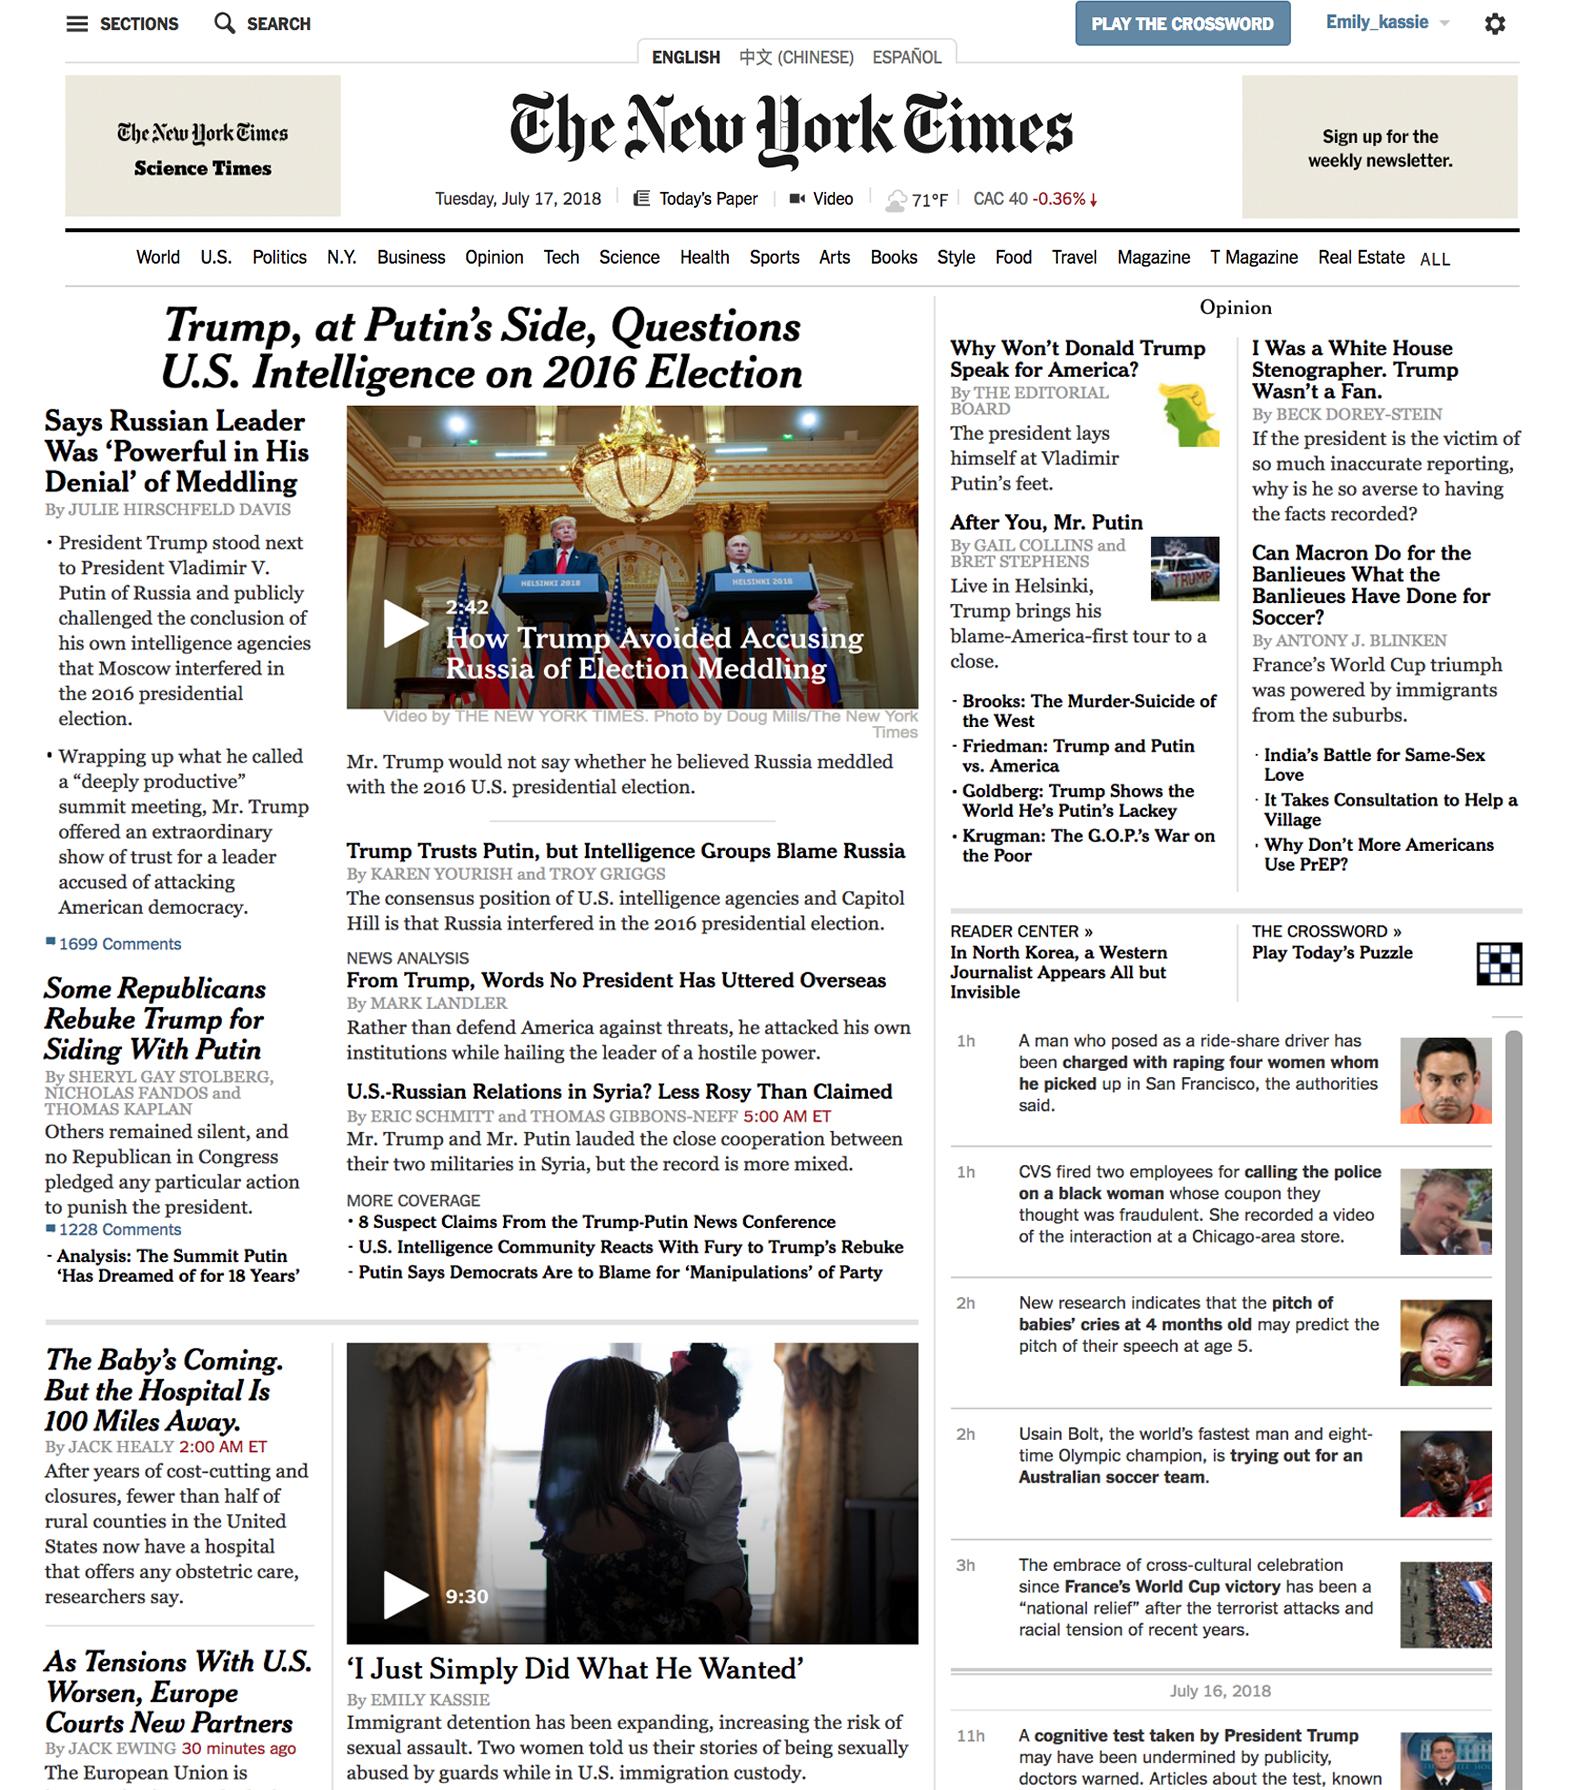 the new york timesfrontpage.jpg